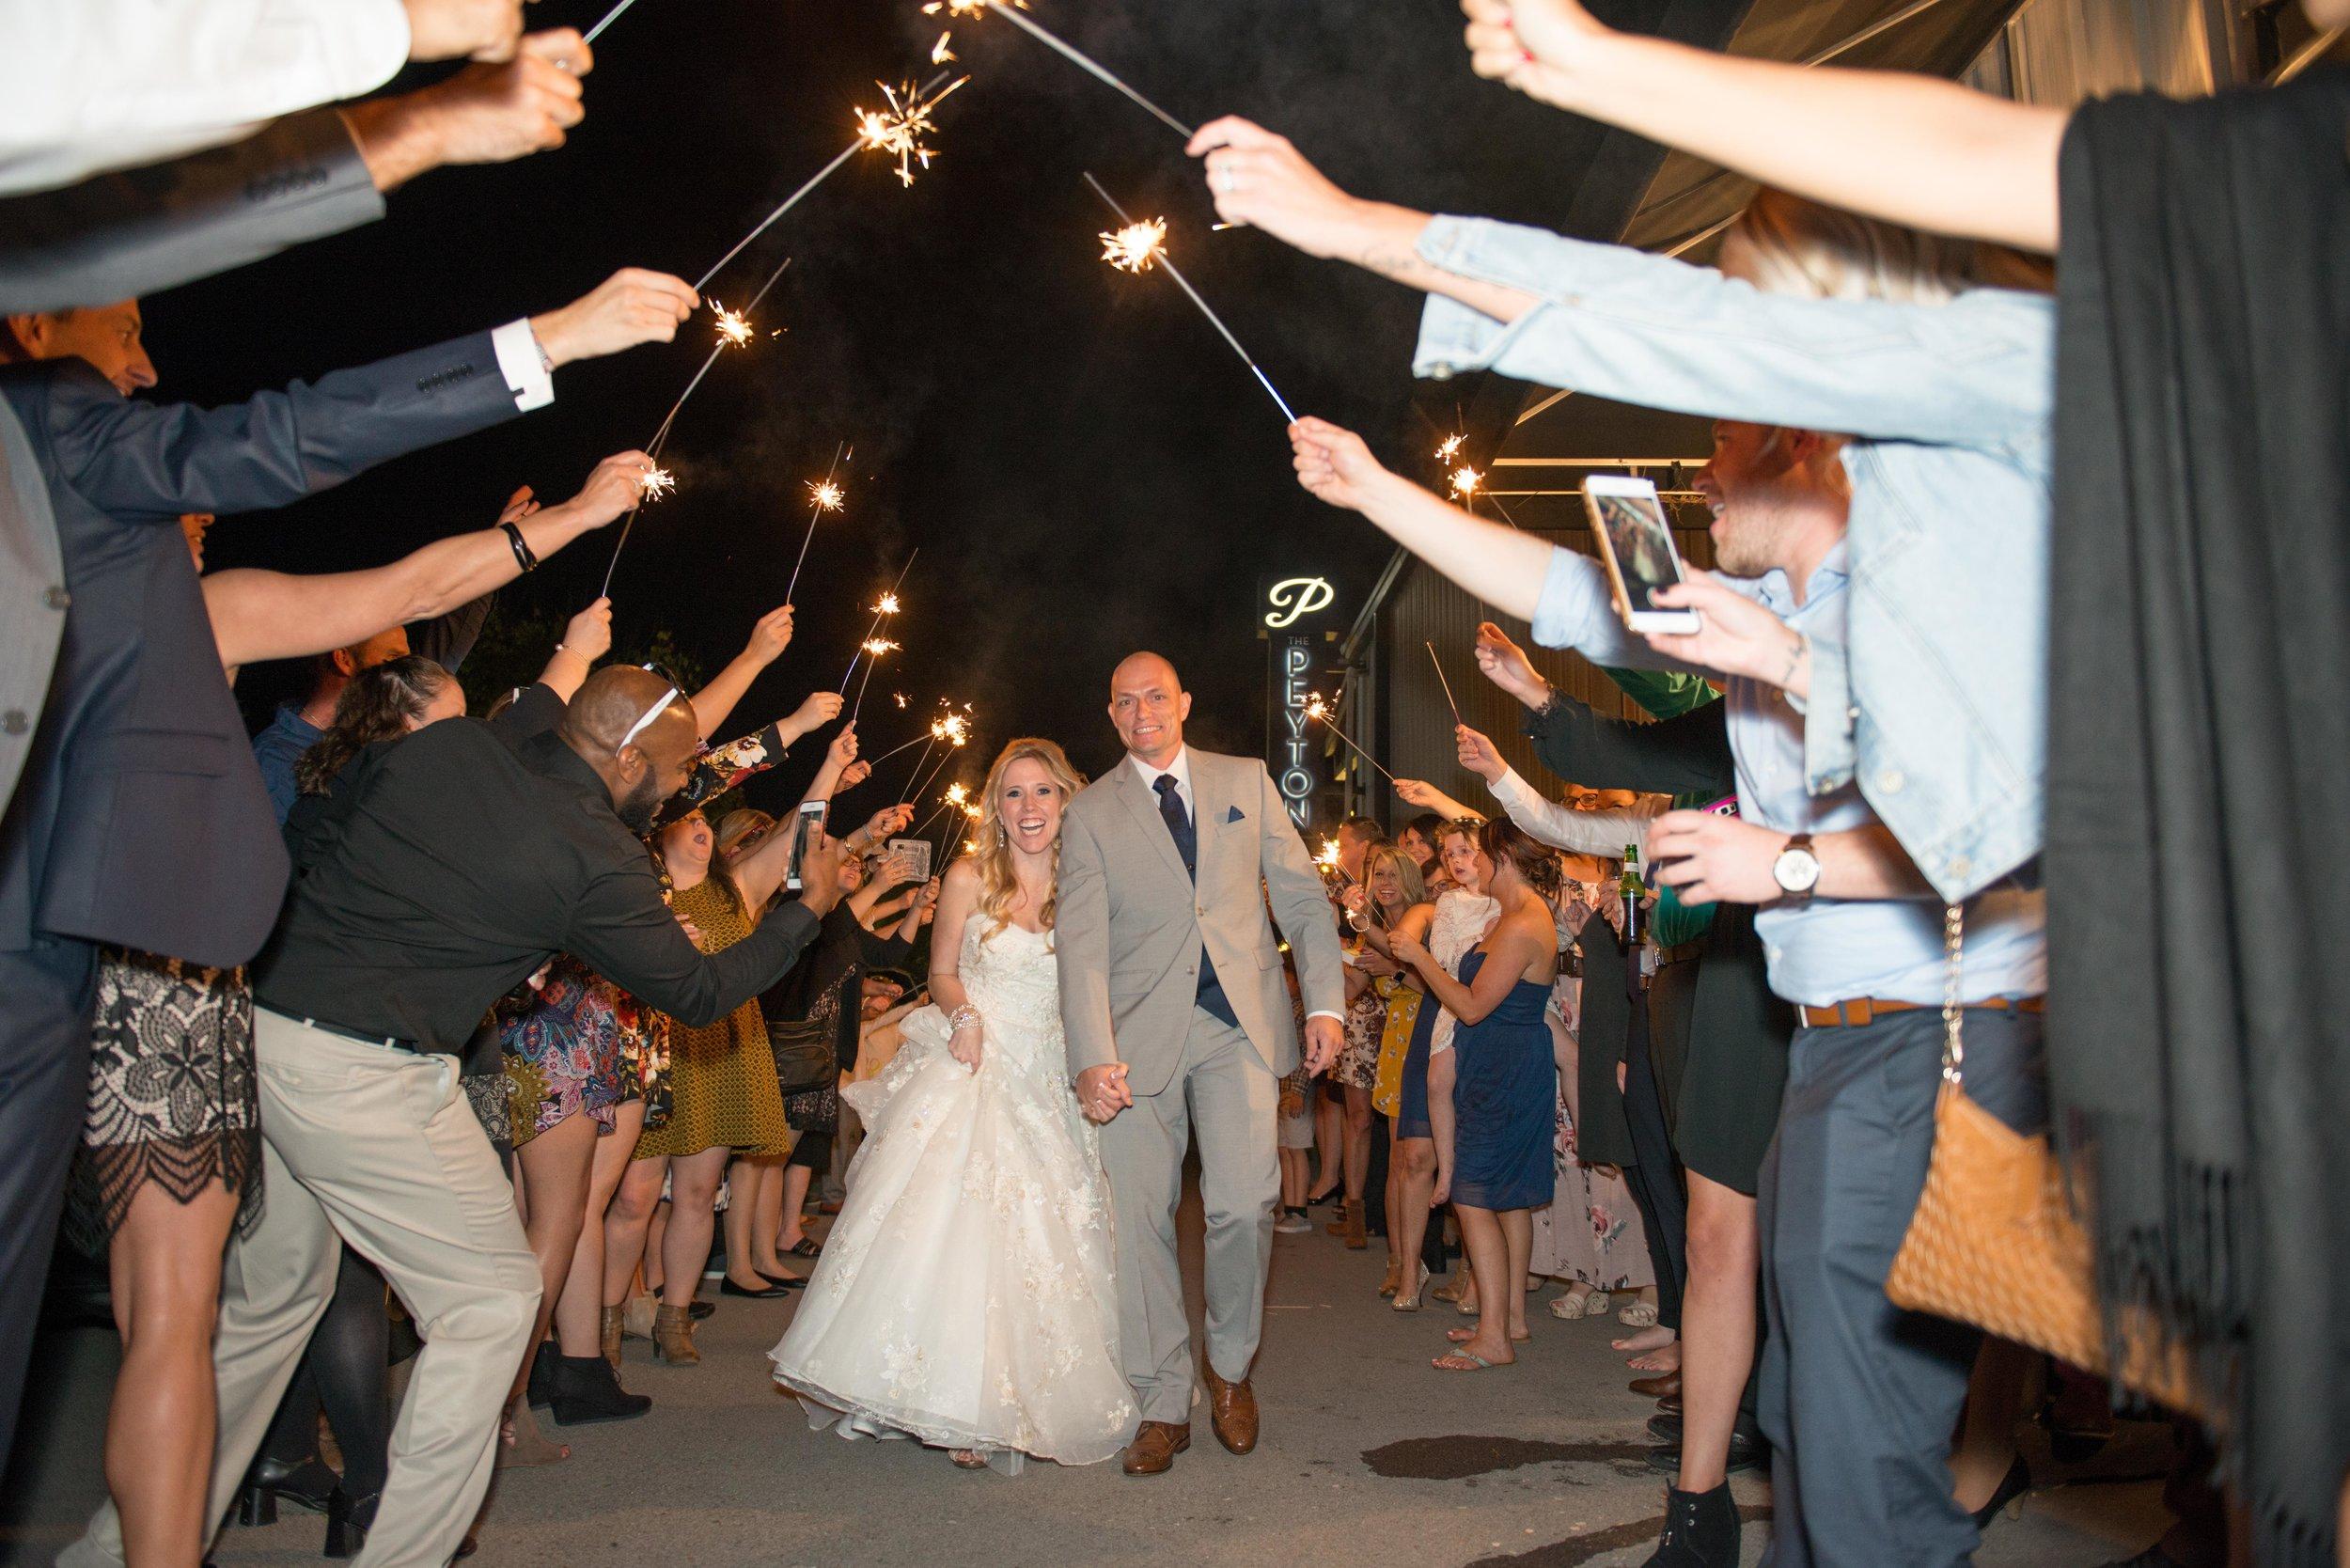 00001_Kuhnert-Wedding-119.jpg